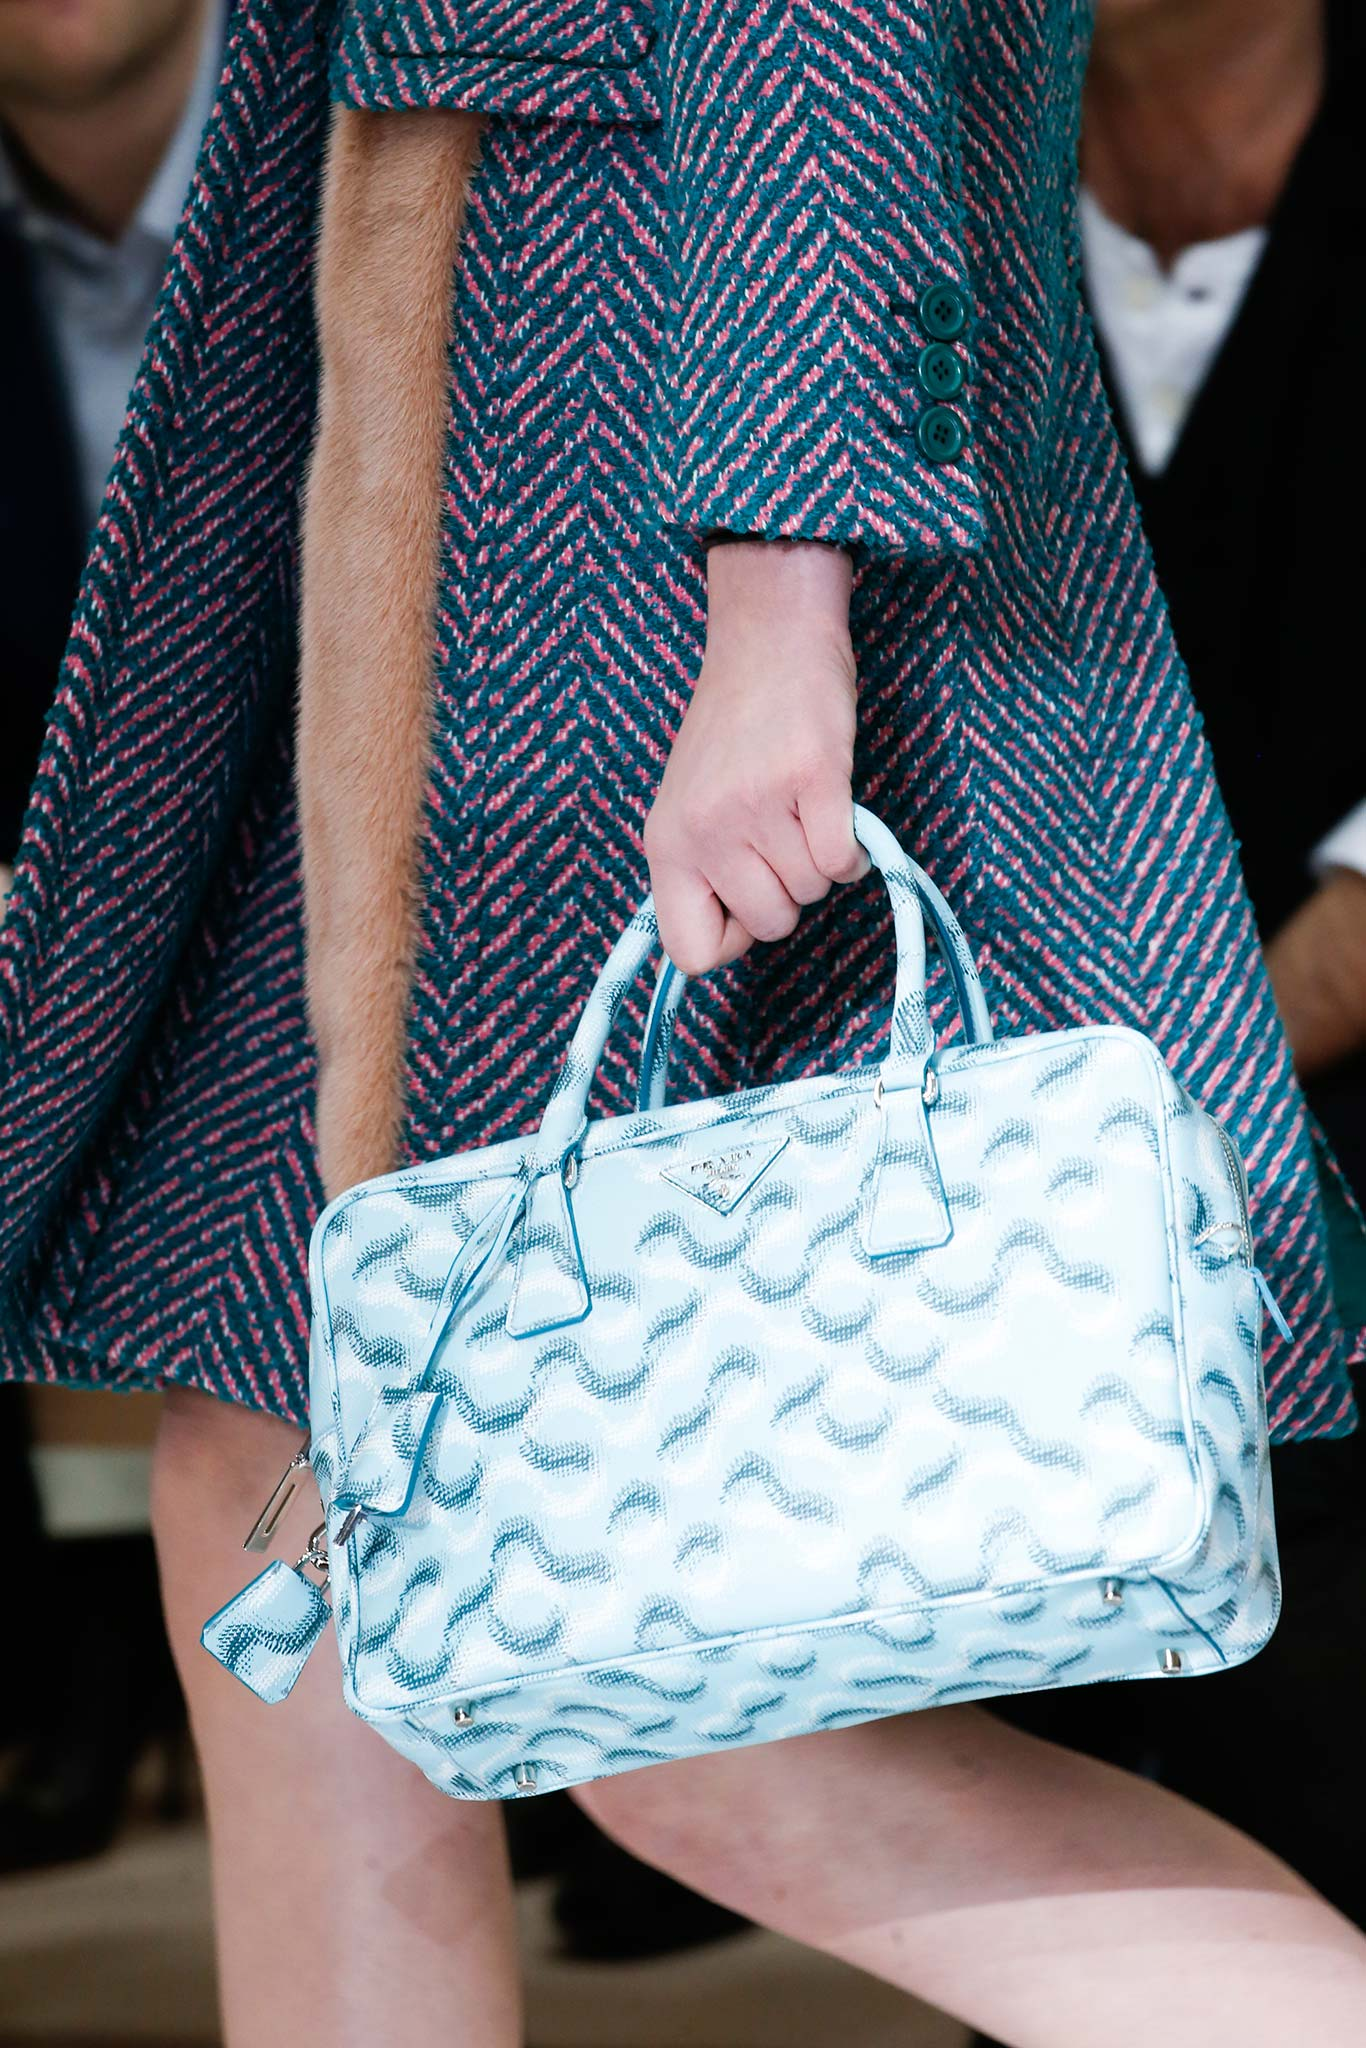 prada new wallet collection - Prada Fall/Winter 2015 Runway Bag Collection Featuring Pastel ...